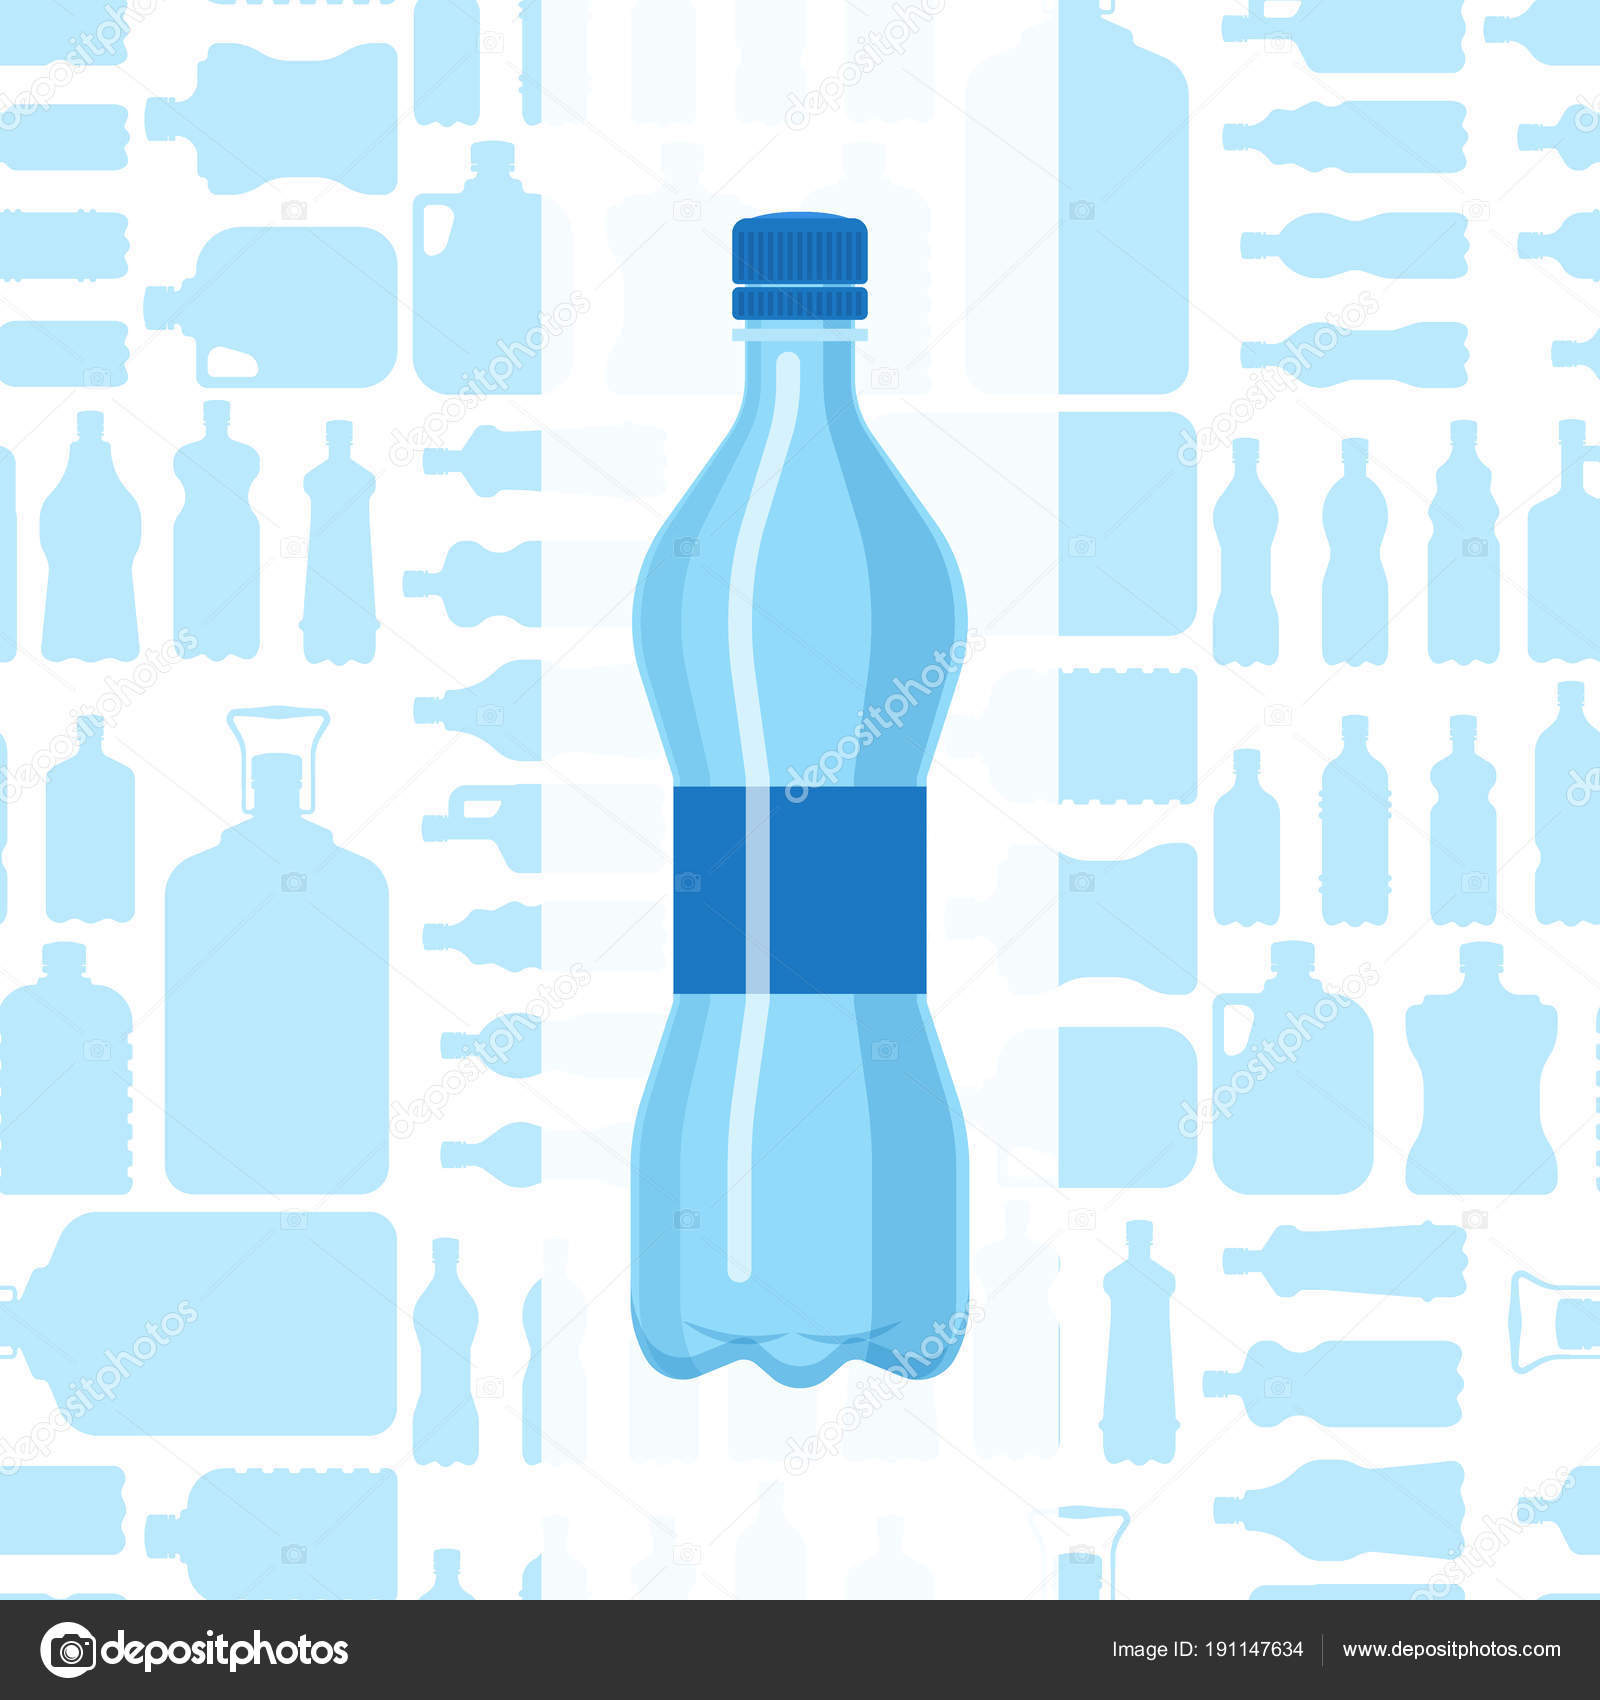 plastic water bottle vector blank brochure nature blue clean liquid aqua fluid blank template silhouette template